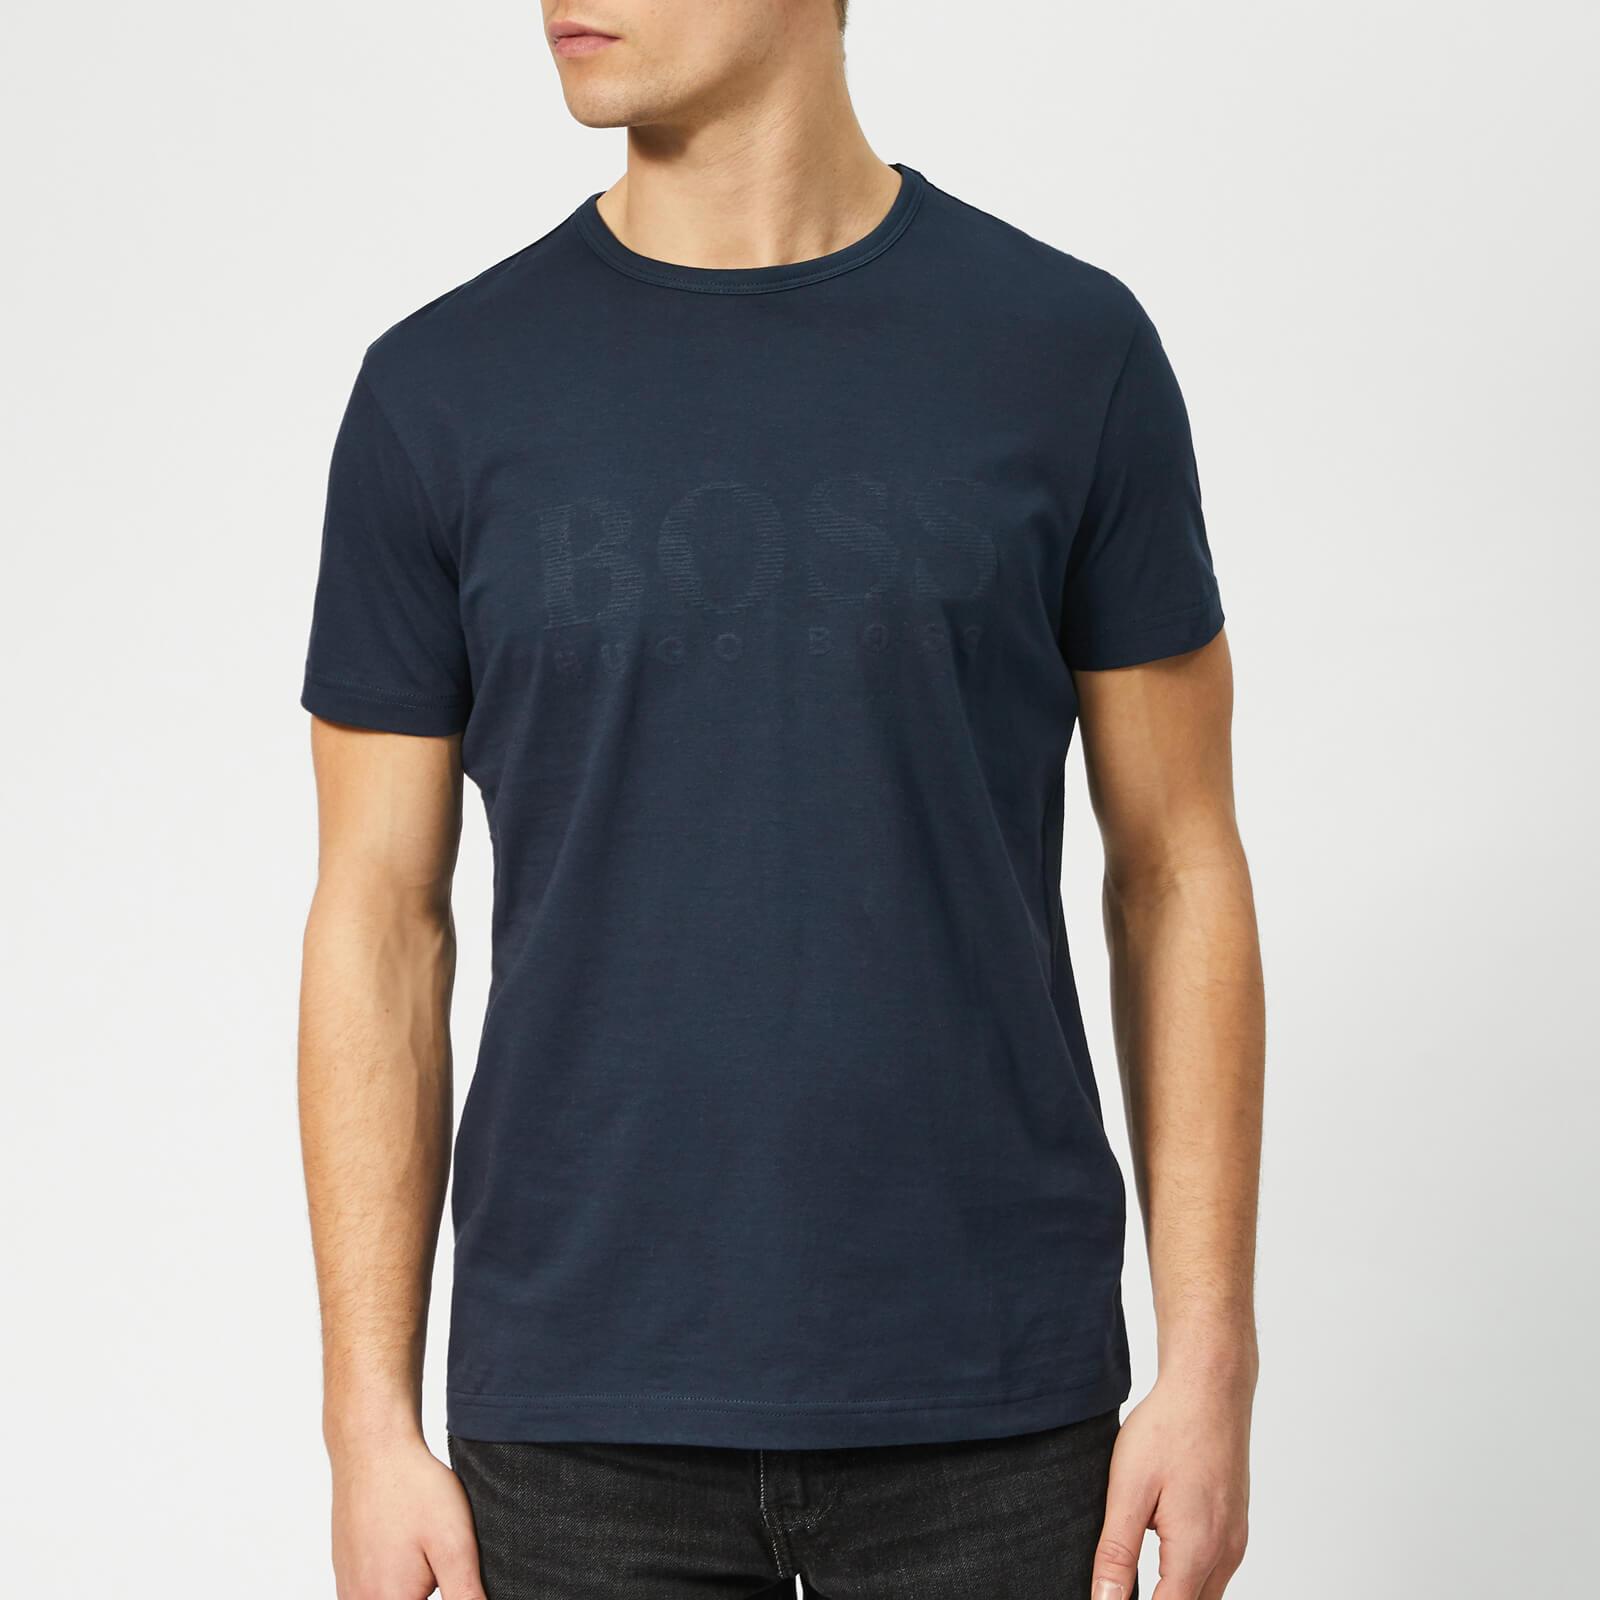 Boss Men's Basic Large Brand Chest T-Shirt - Navy - XL - Navy